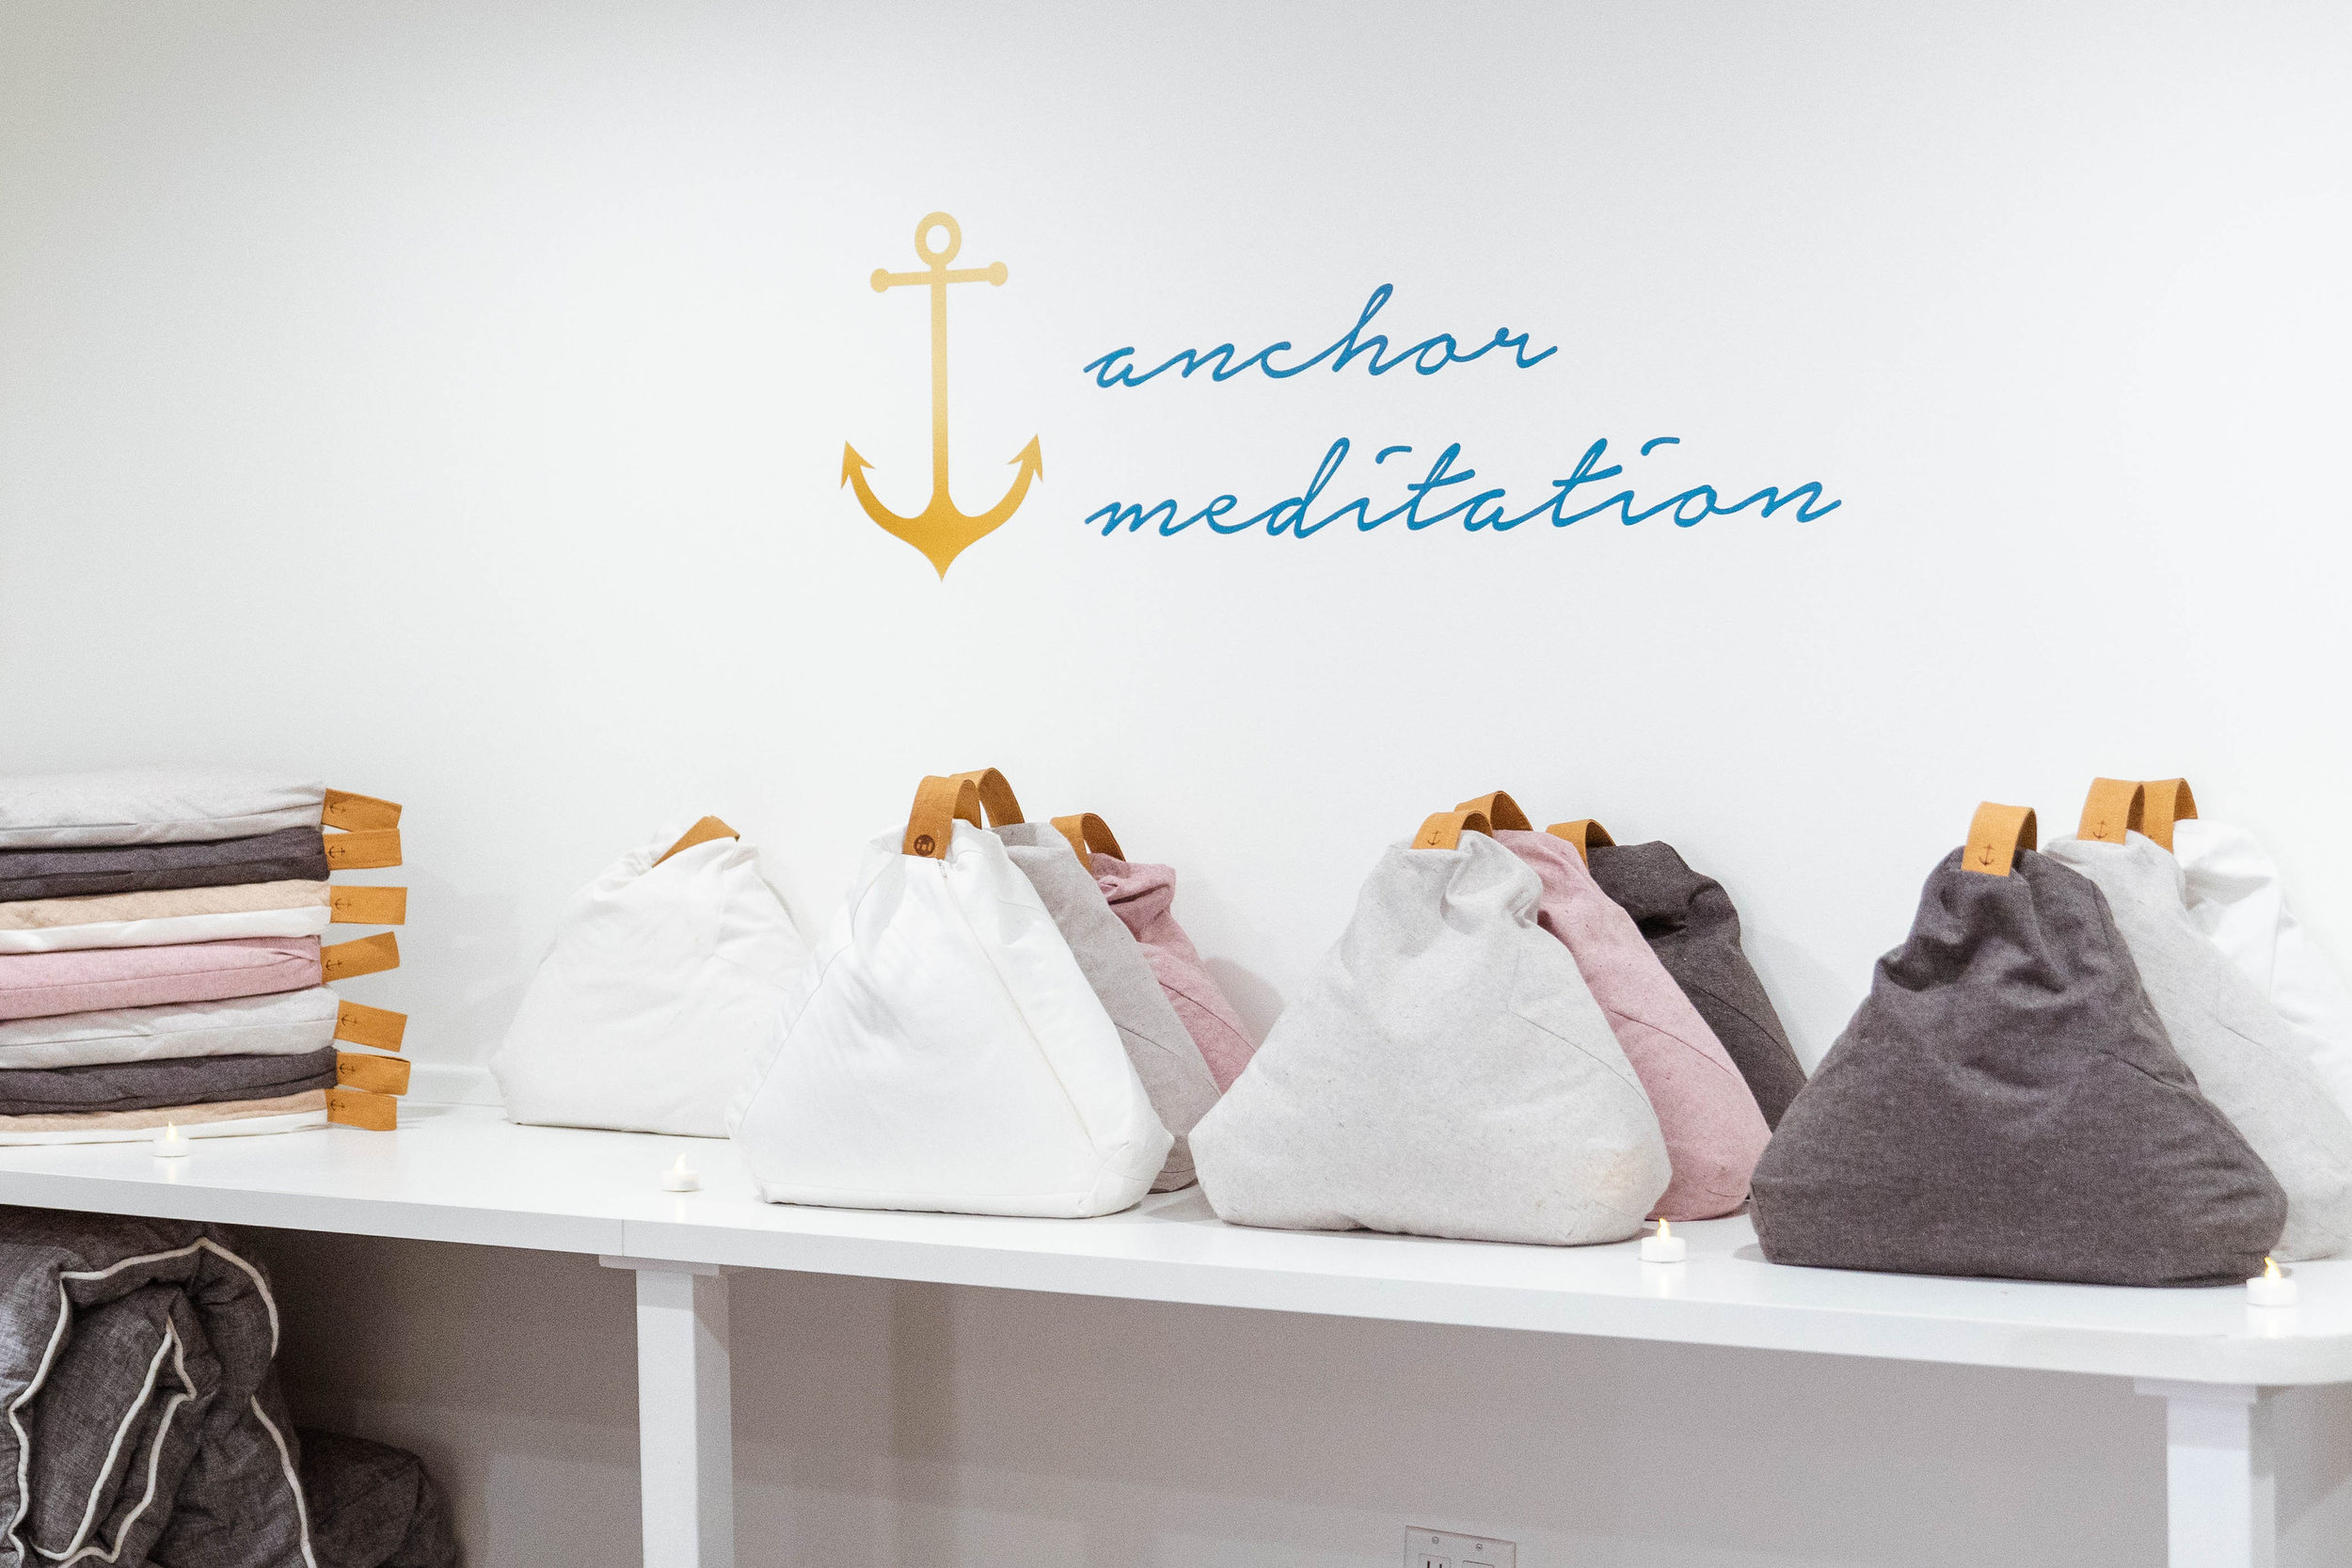 18-11-04-Bumble-Anchor-Meditation-18.jpg